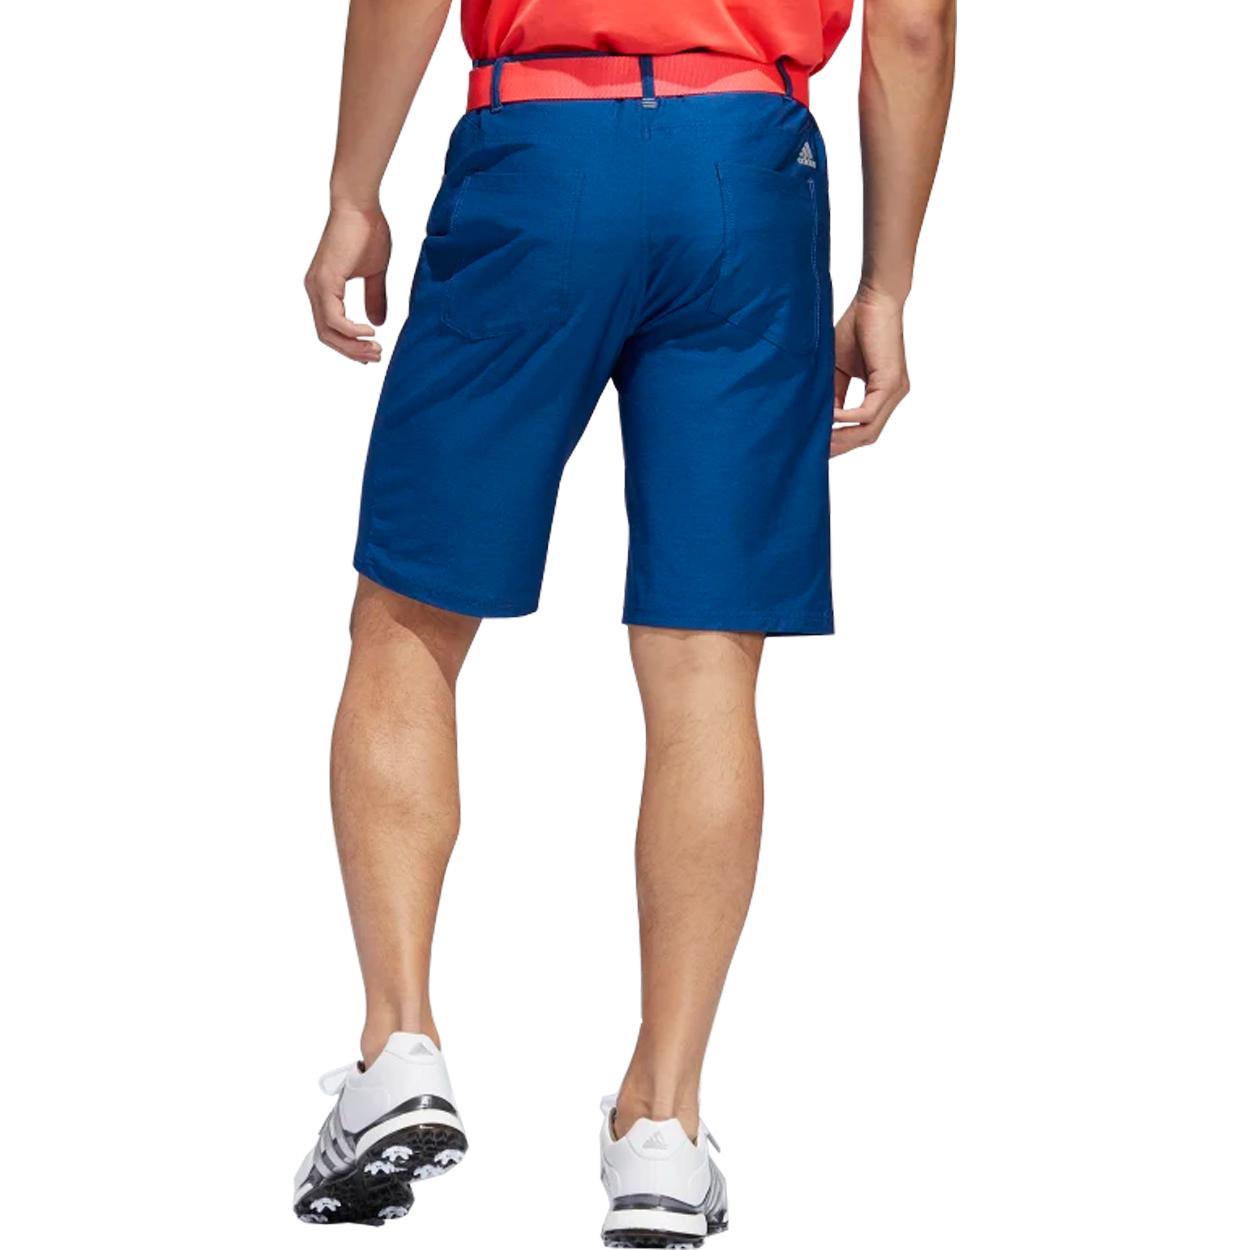 Adidas-Golf-Men-039-s-Ultimate365-Heather-5-Pocket-Shorts-Brand-New thumbnail 5